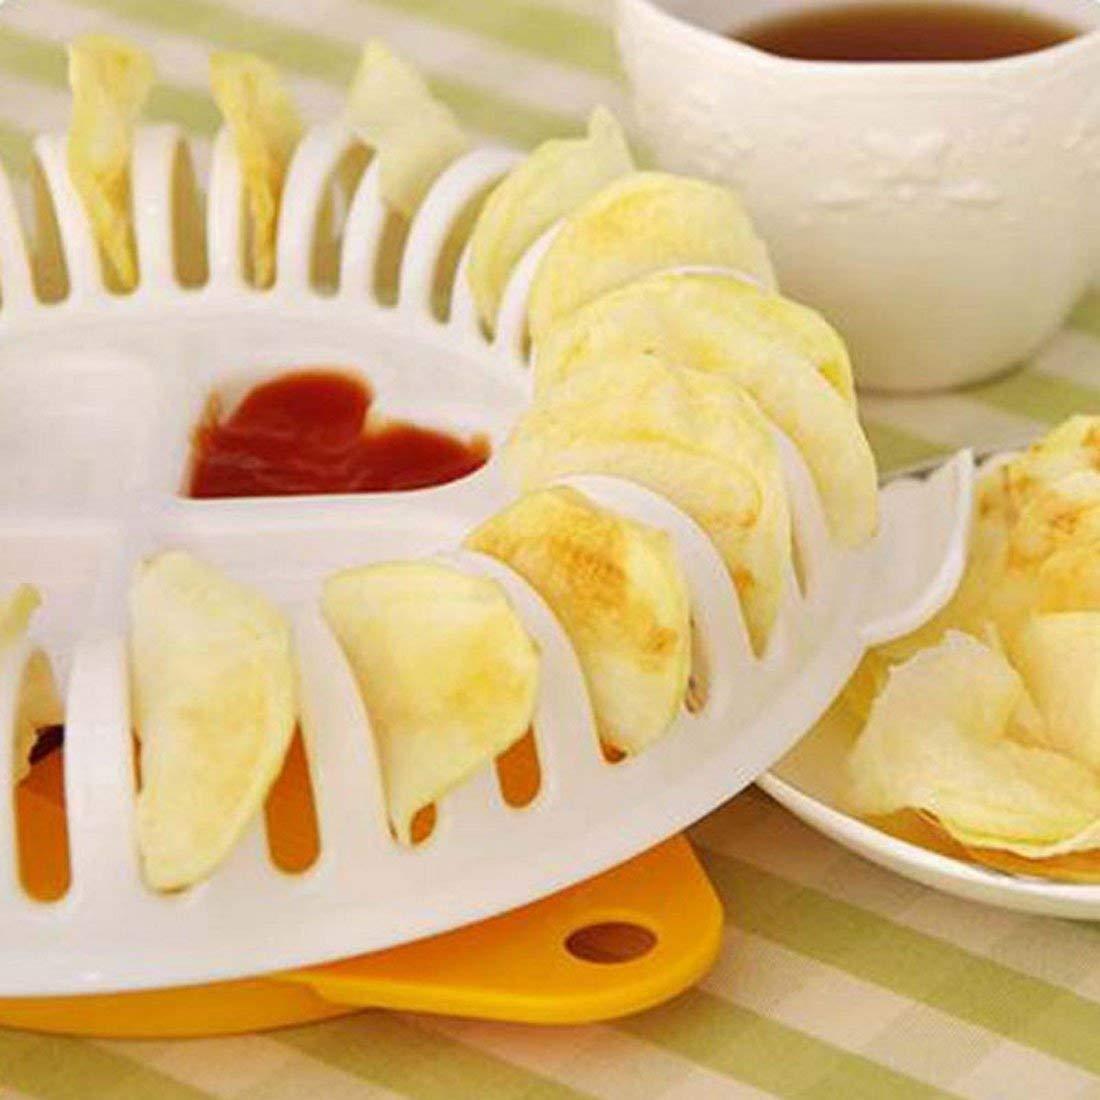 zhenchengshangpin - Bandeja para hornear patatas fritas ...